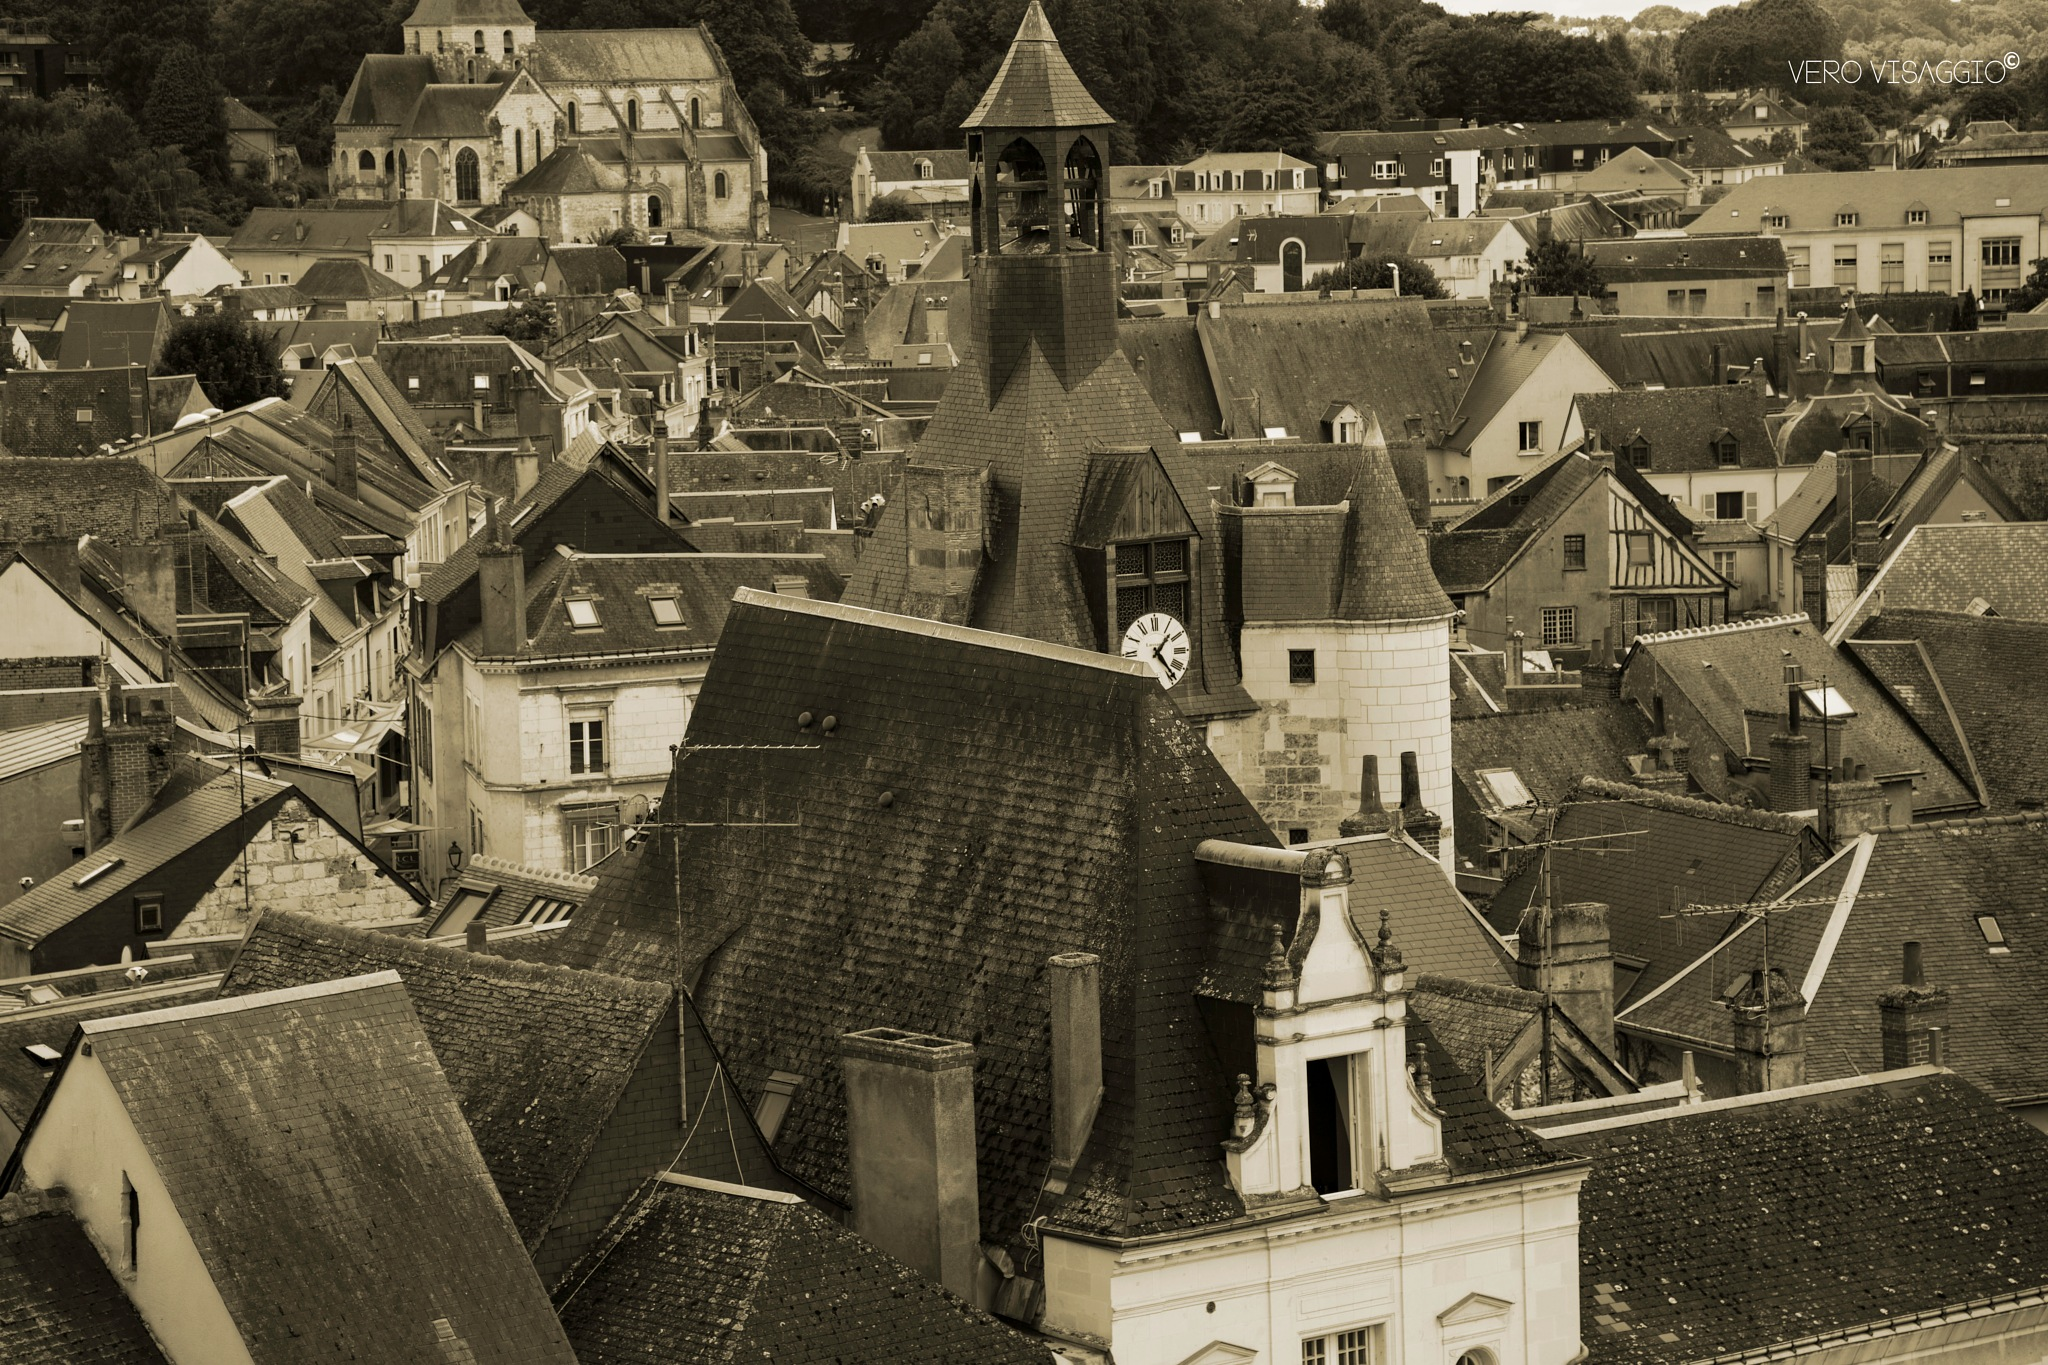 Amboise by verovisaggio